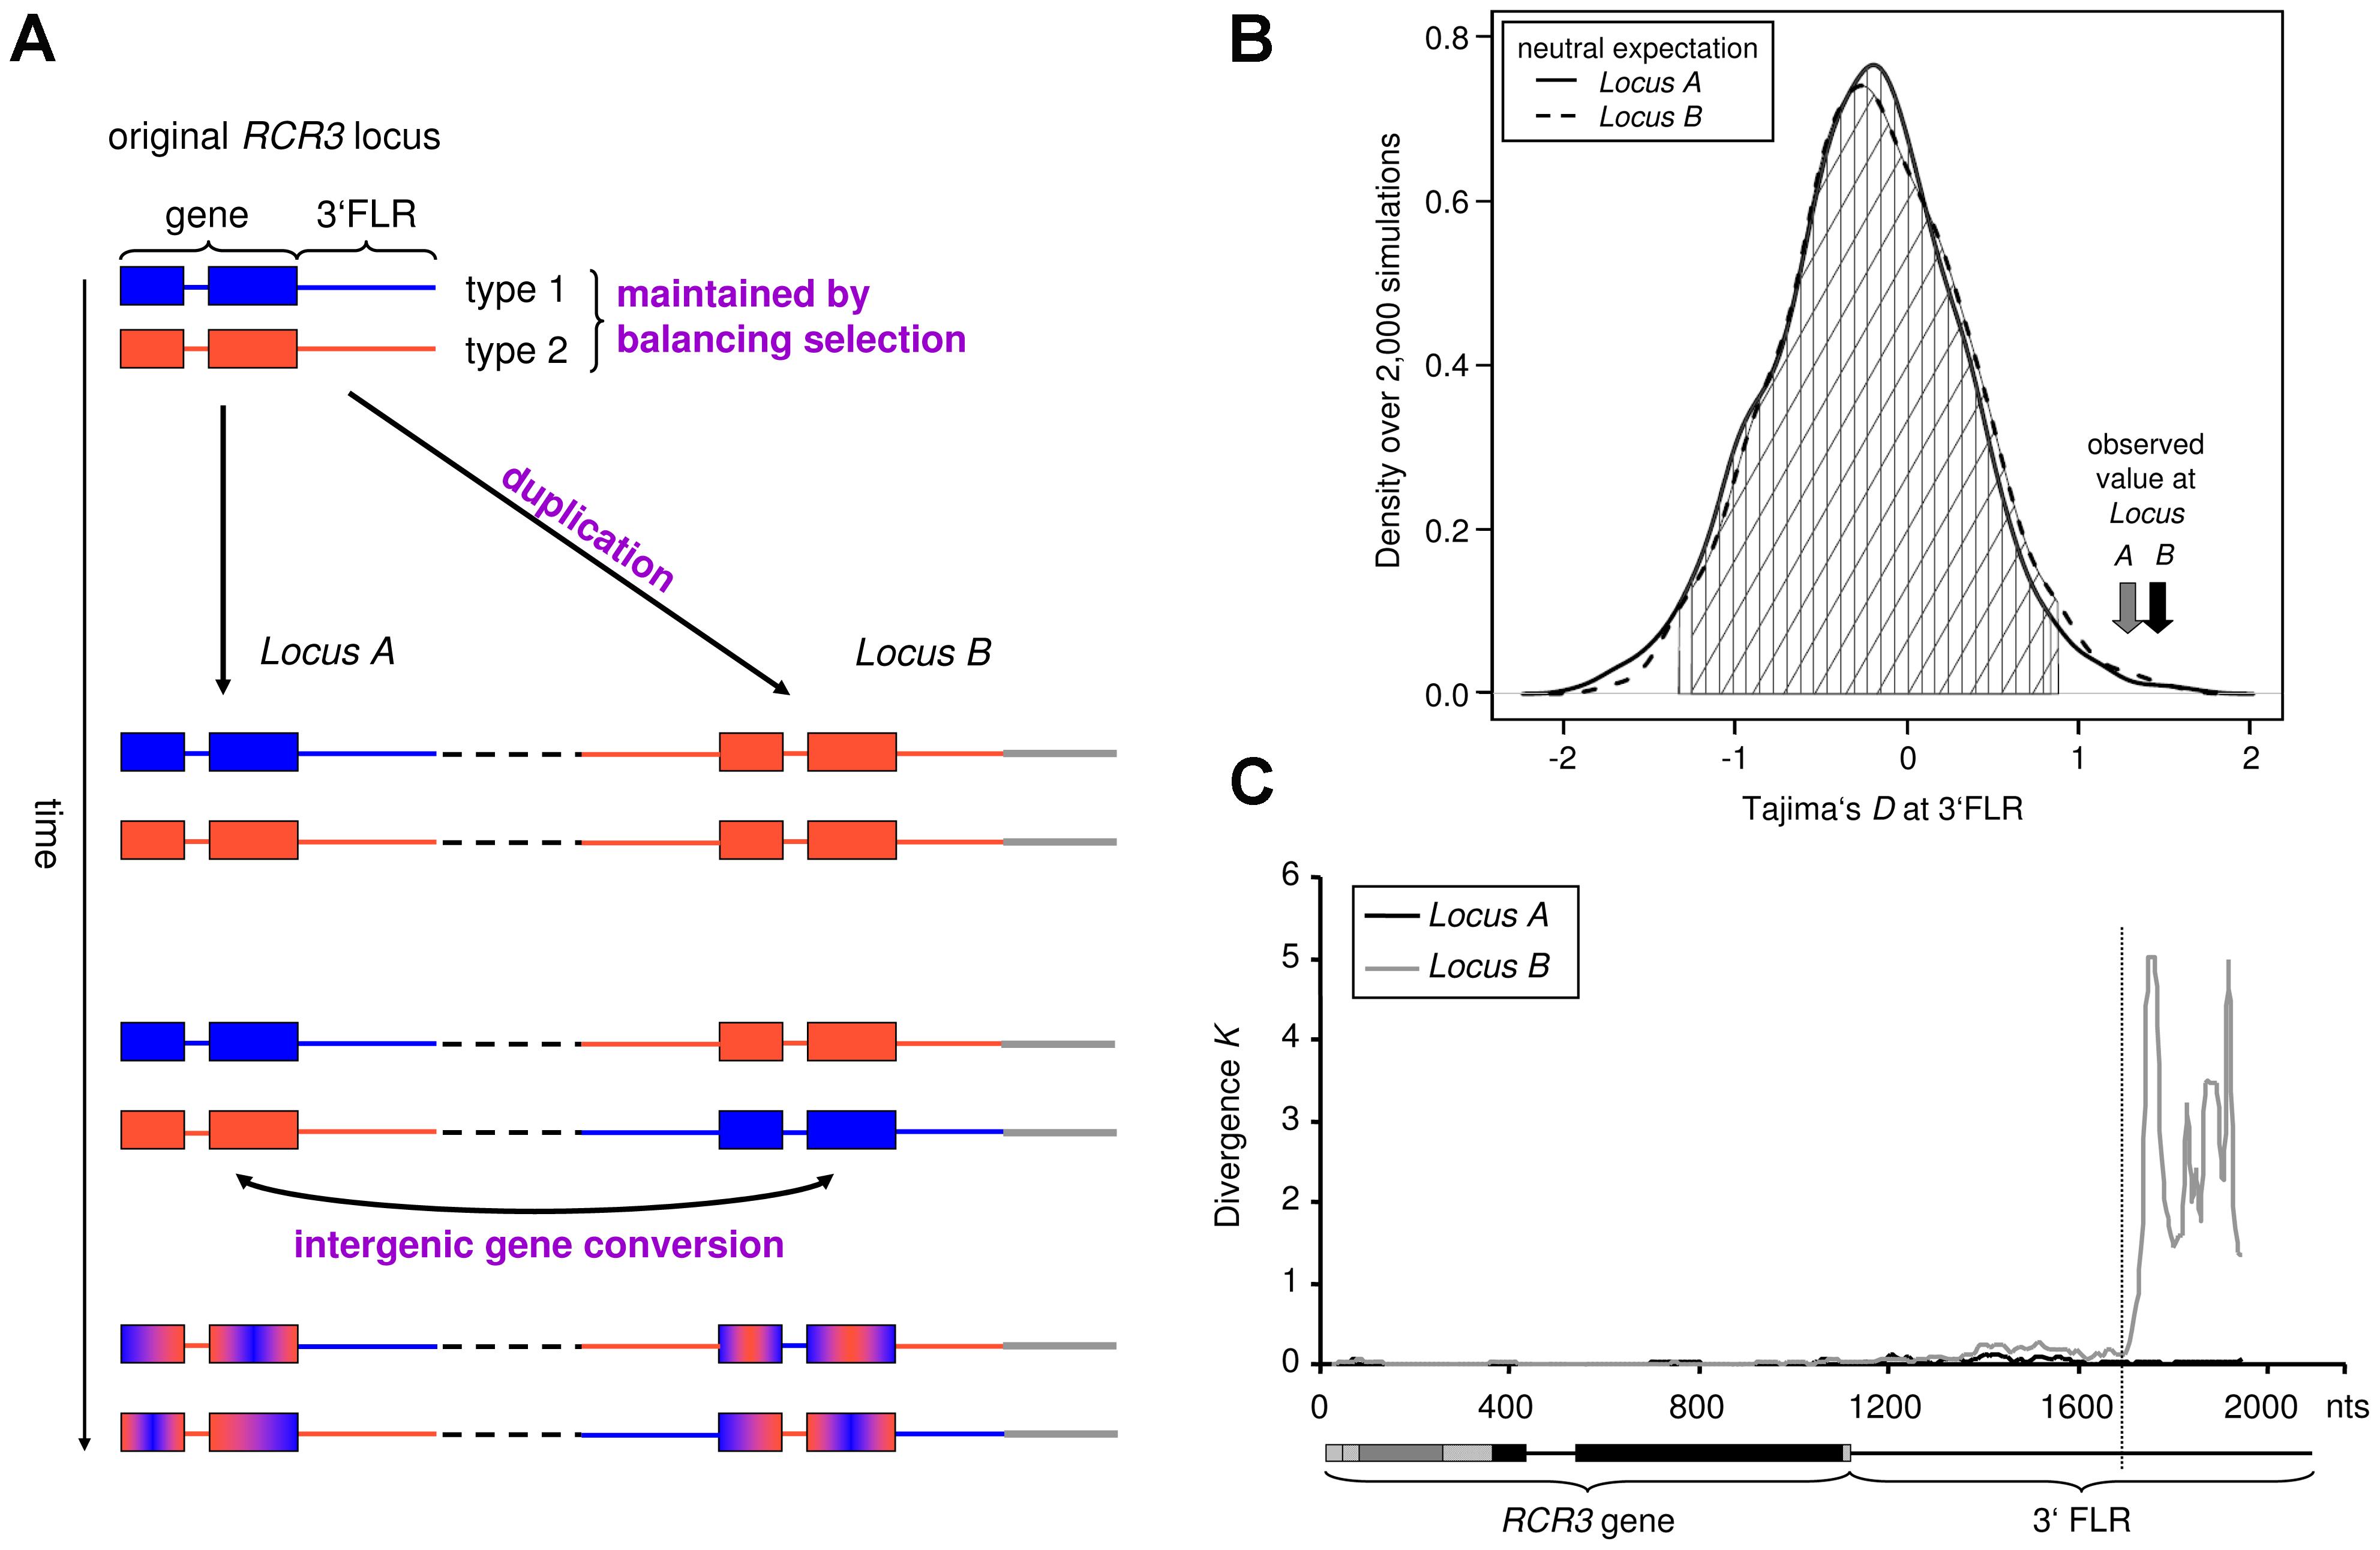 Evolutionary history of the <i>RCR3</i> gene family (<i>Locus A</i> and <i>B</i>).